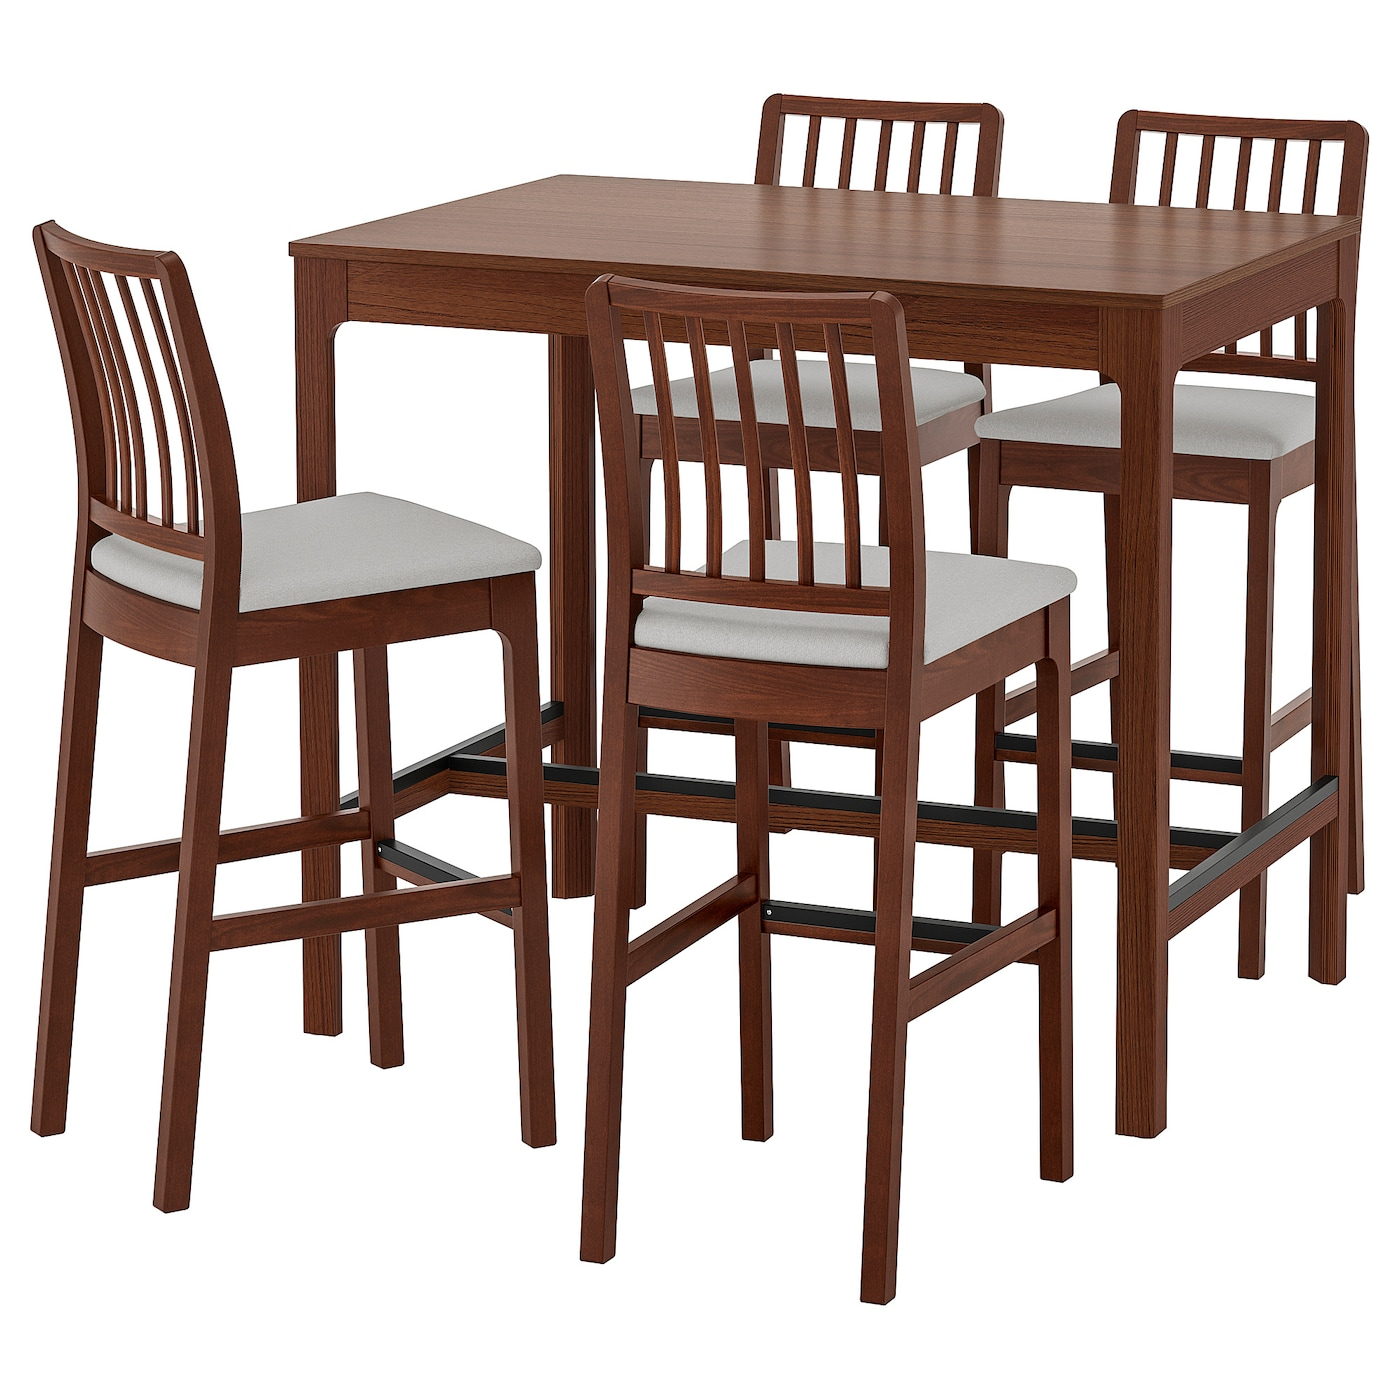 EKEDALEN / EKEDALEN Table haute + 4 tabourets bar - IKEA